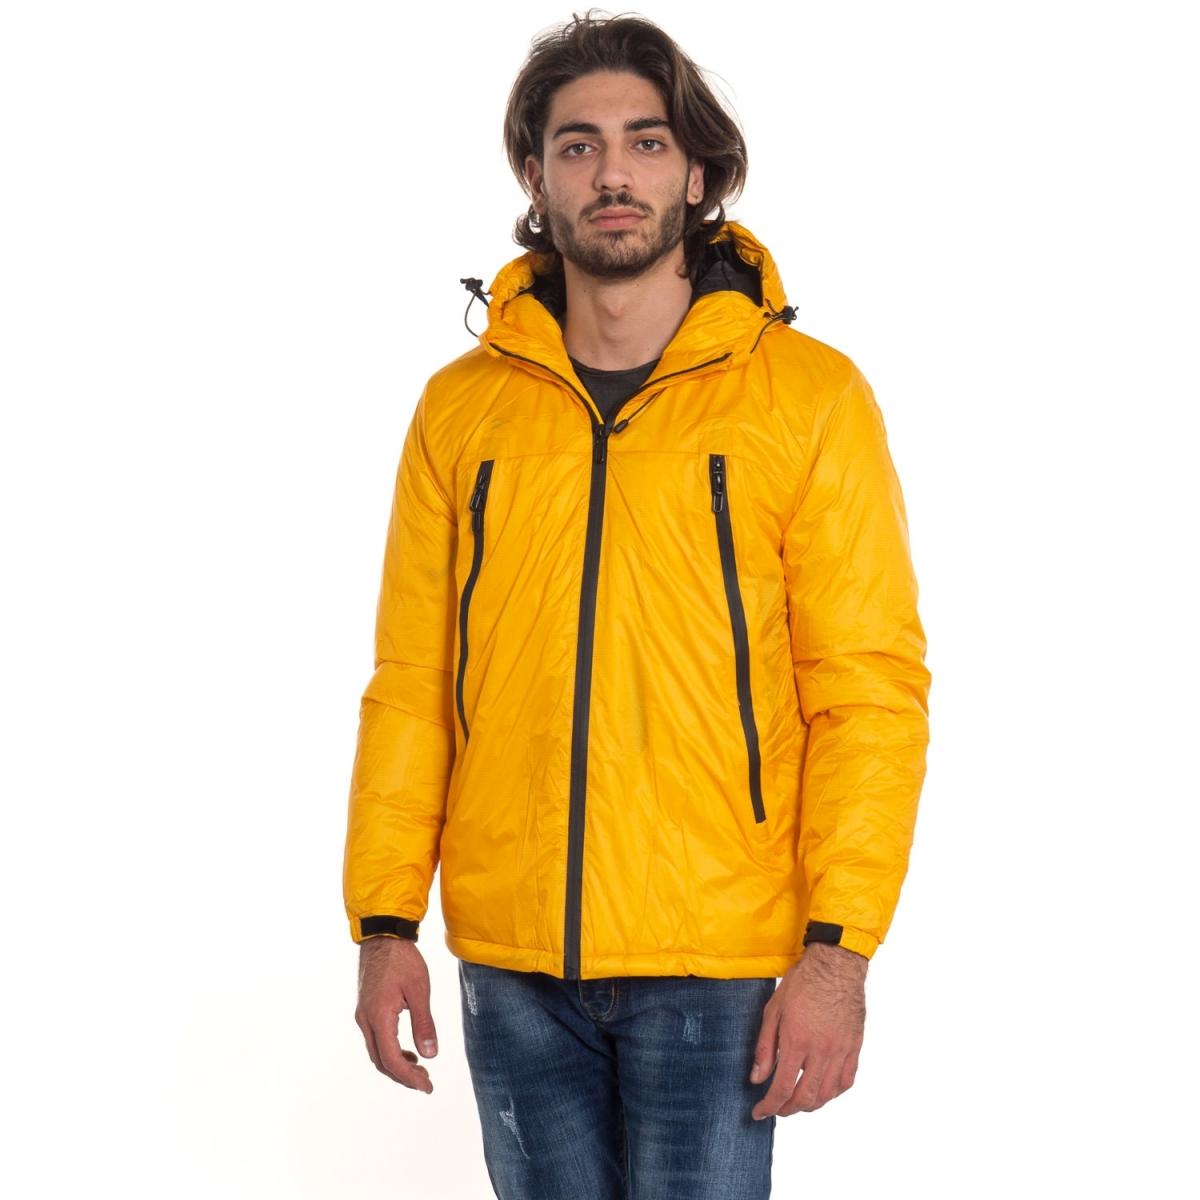 abbigliamento Giubbini uomo Giubbotto impermeabile LPBBK52007 LANDEK PARK Cafedelmar Shop